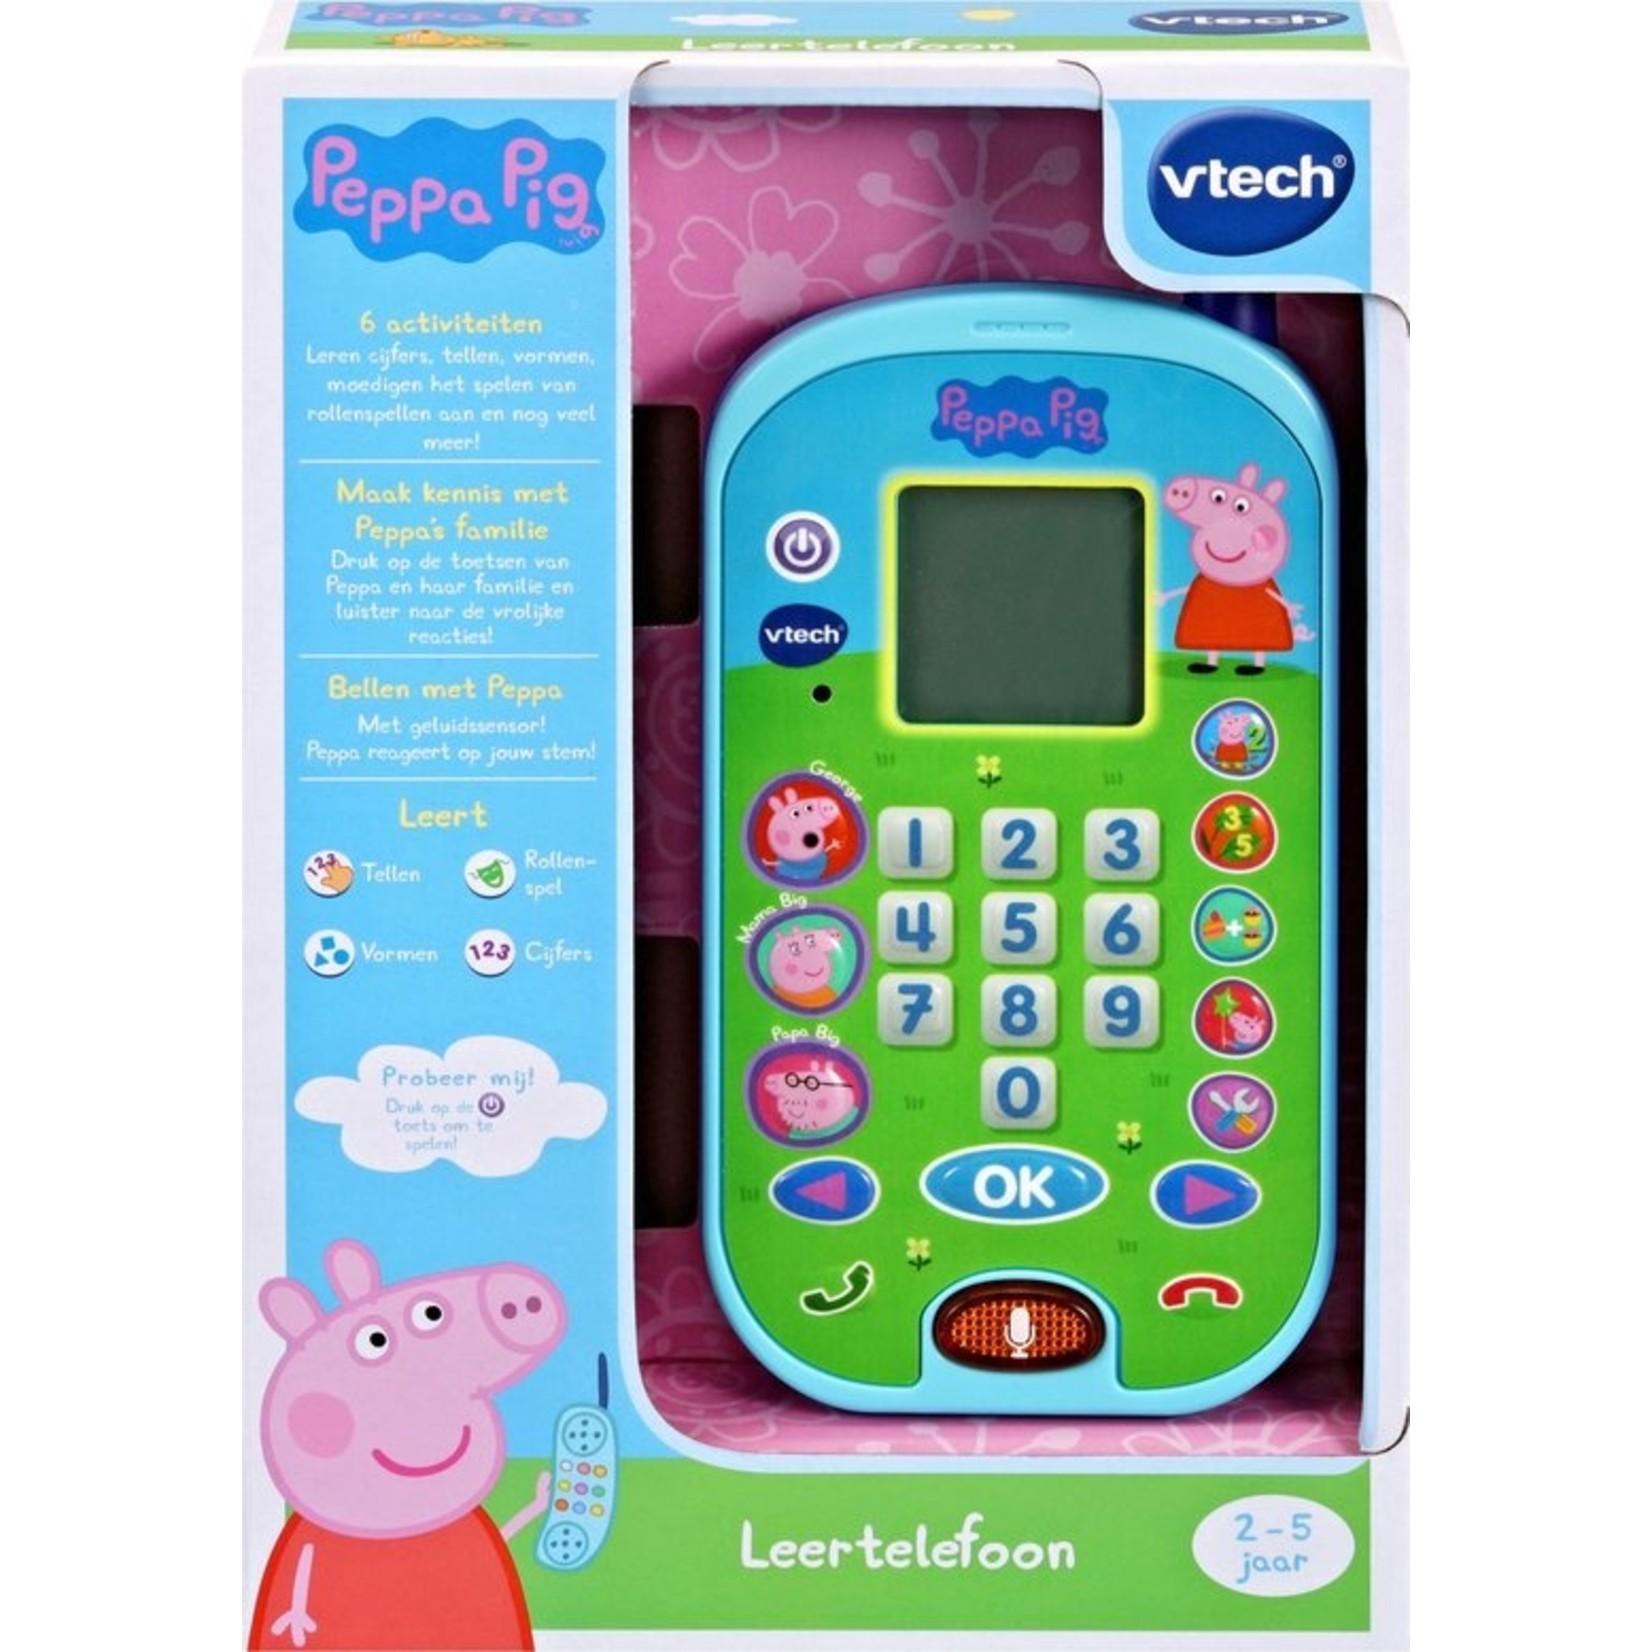 VTECH Peppa Pig Telefoon